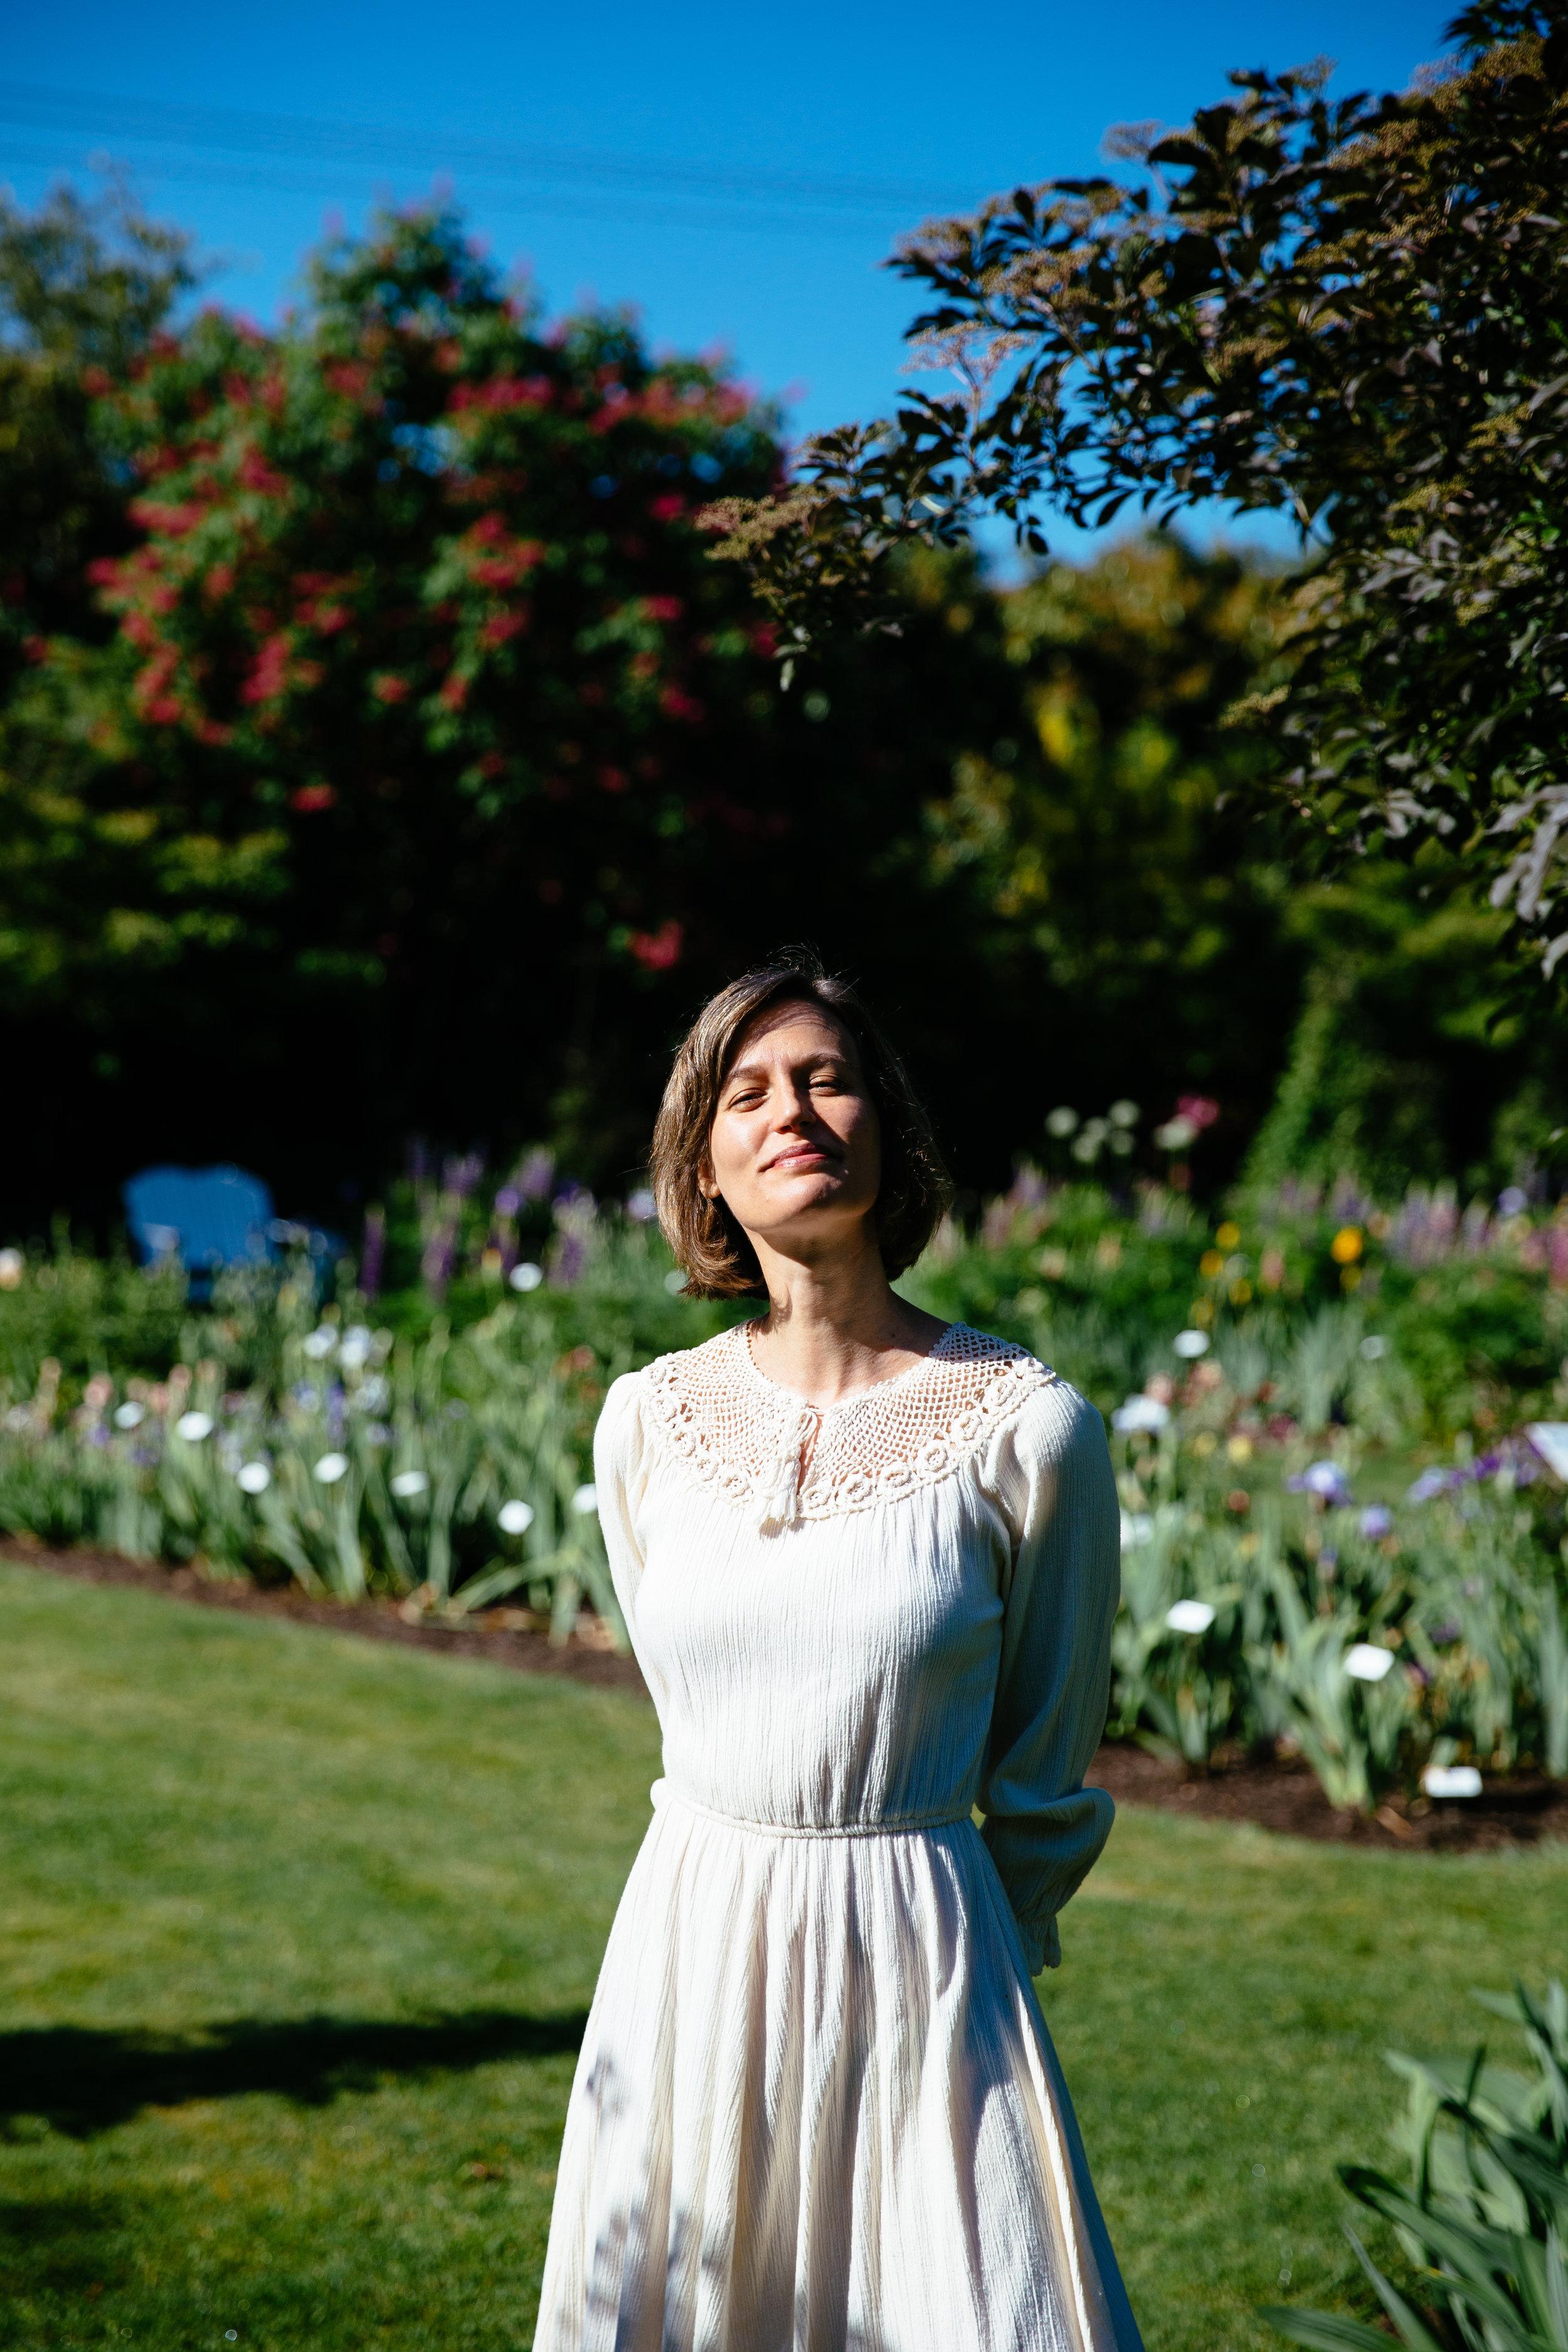 Elaine Schimek basks in the summer-like warmth